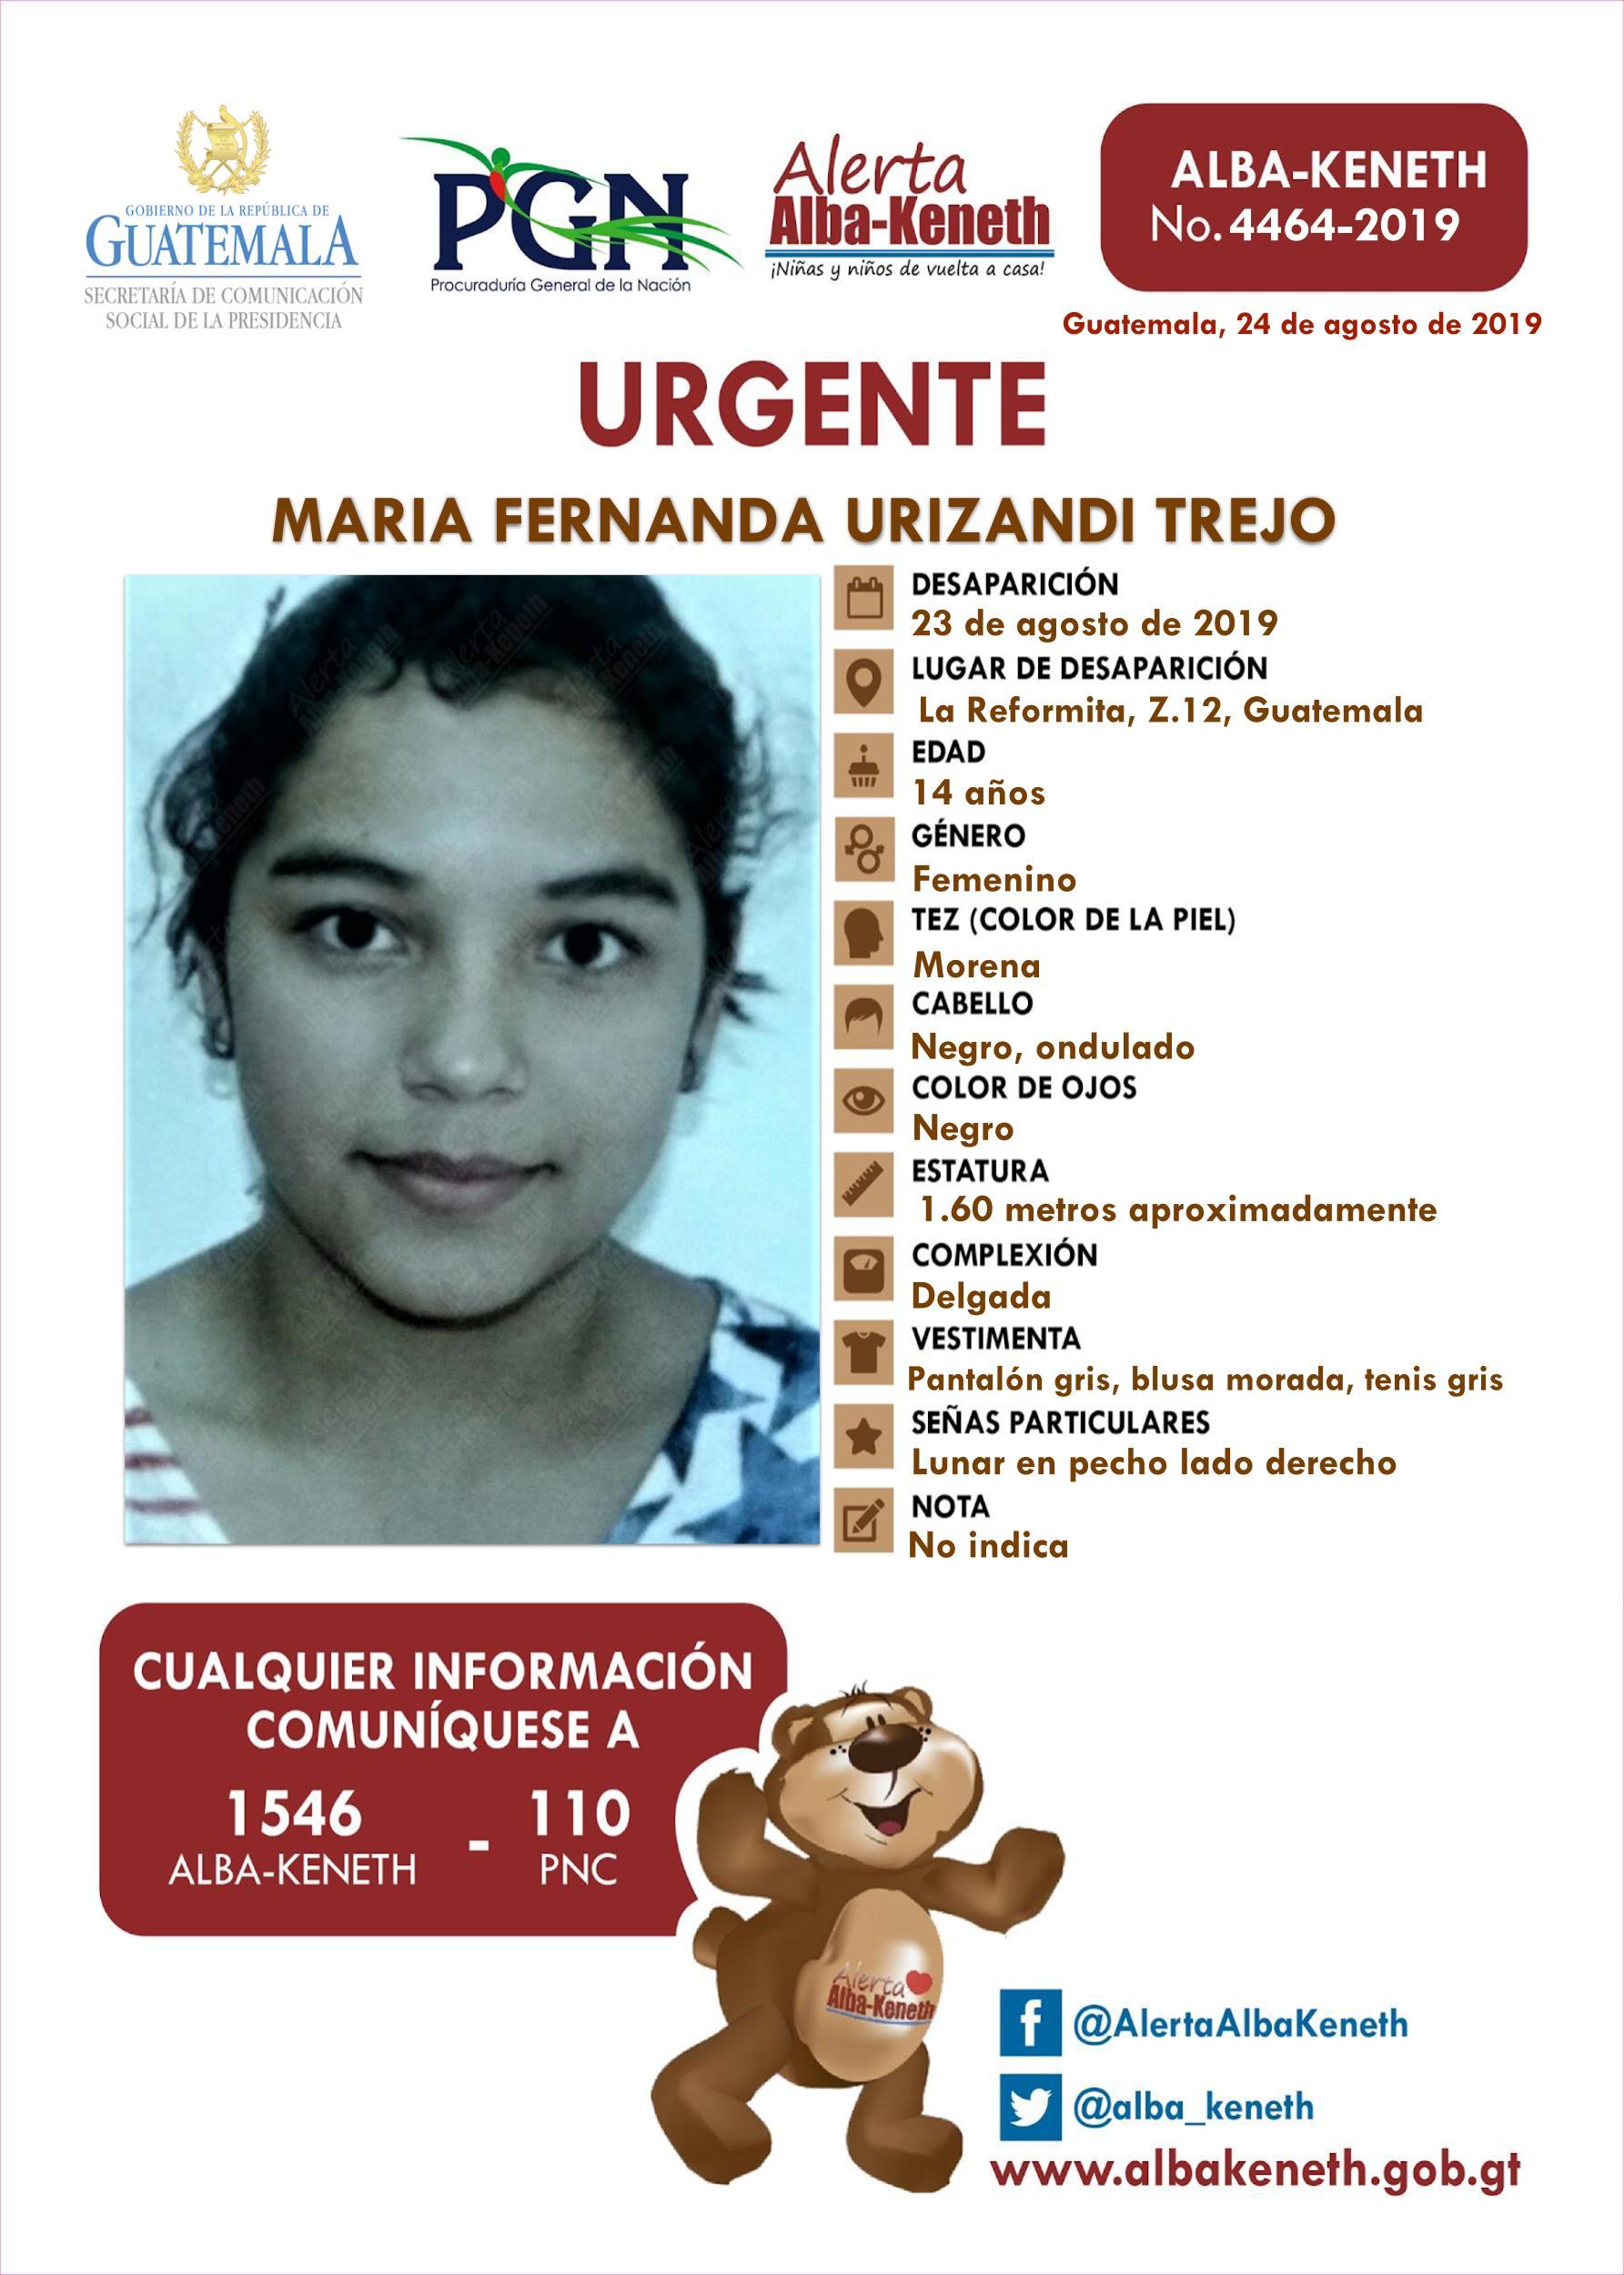 Maria Fernanda Urizando Trejo